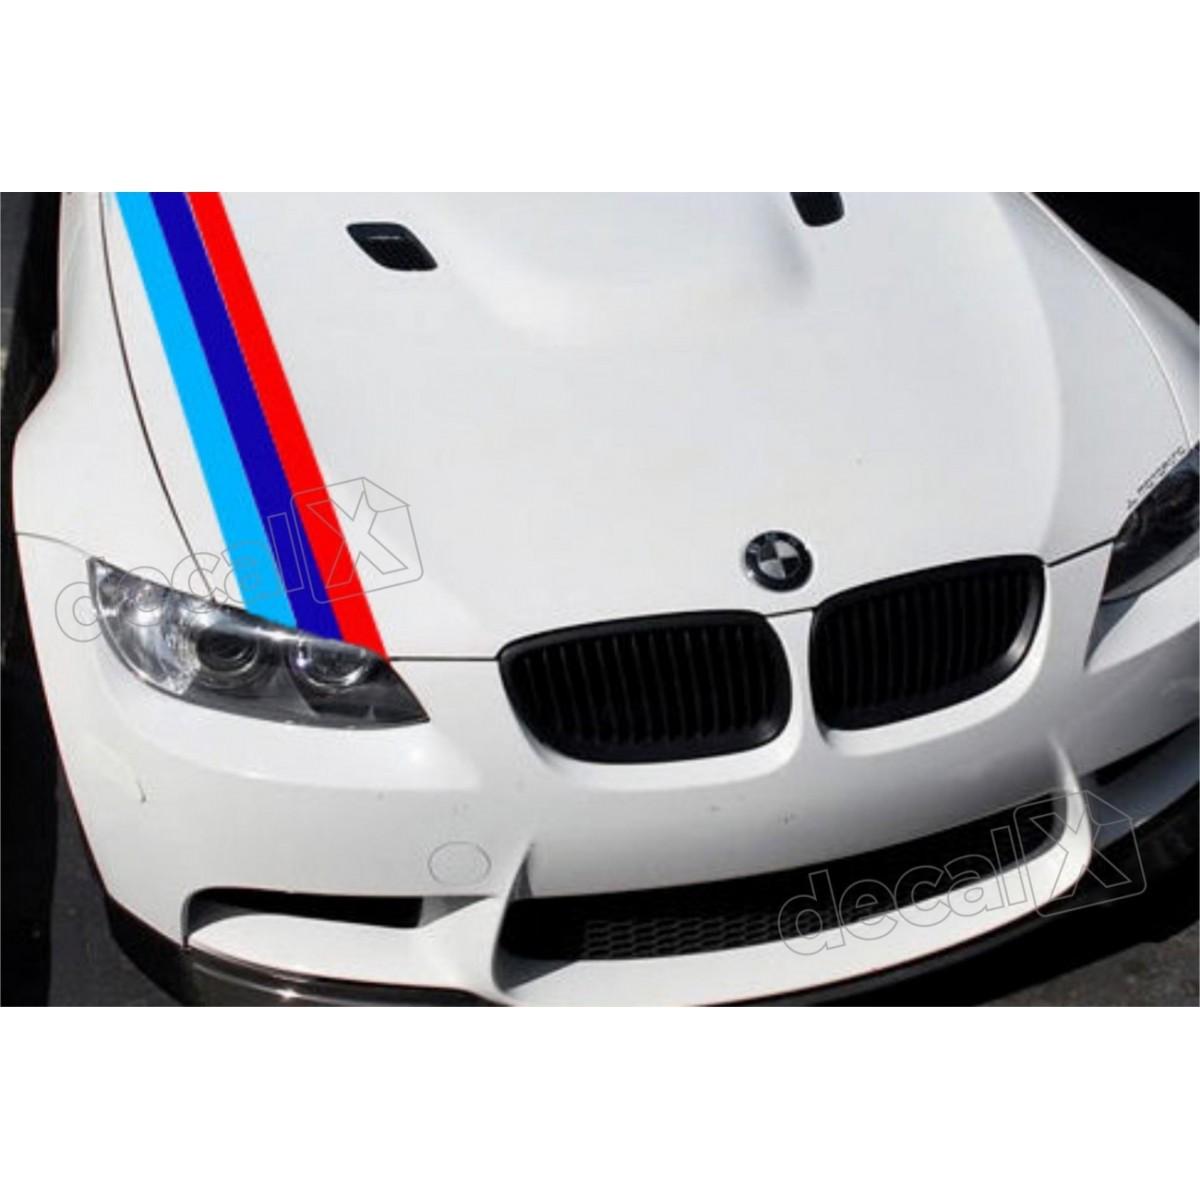 Adesivo Faixa Capo Bmw Tricolor Bw3